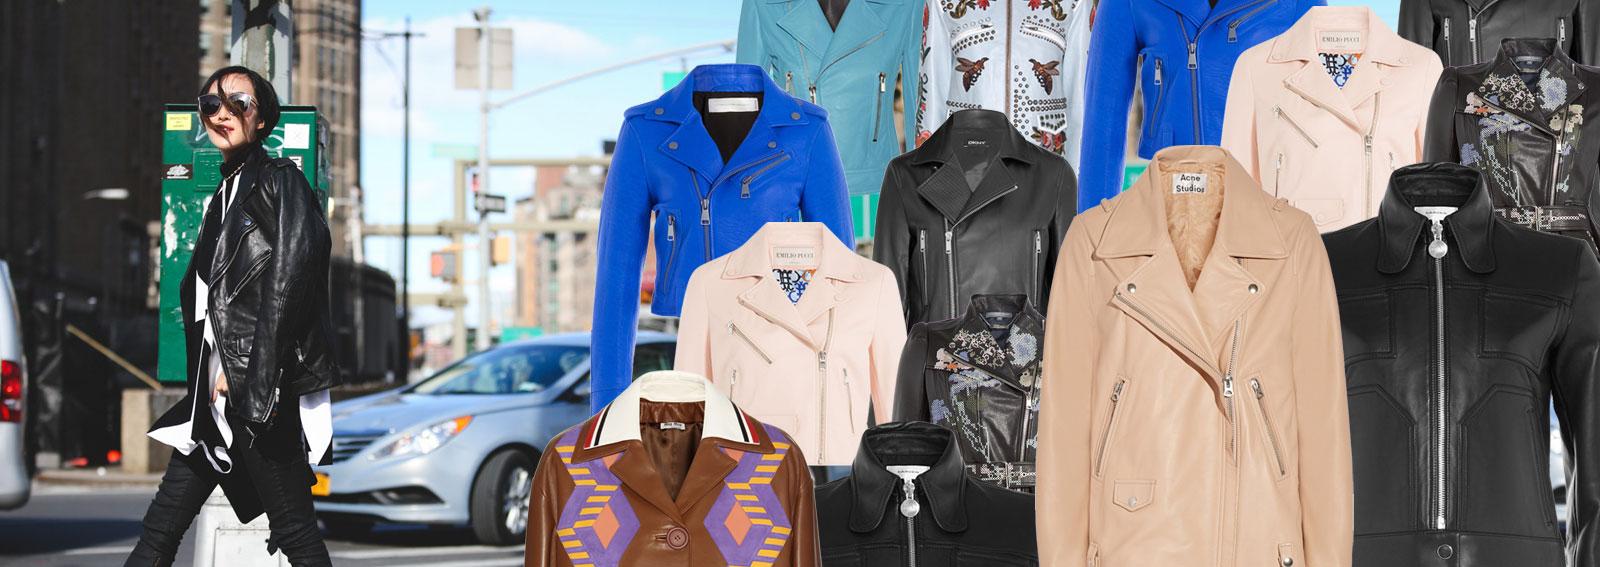 cover giacche di pelle desktop